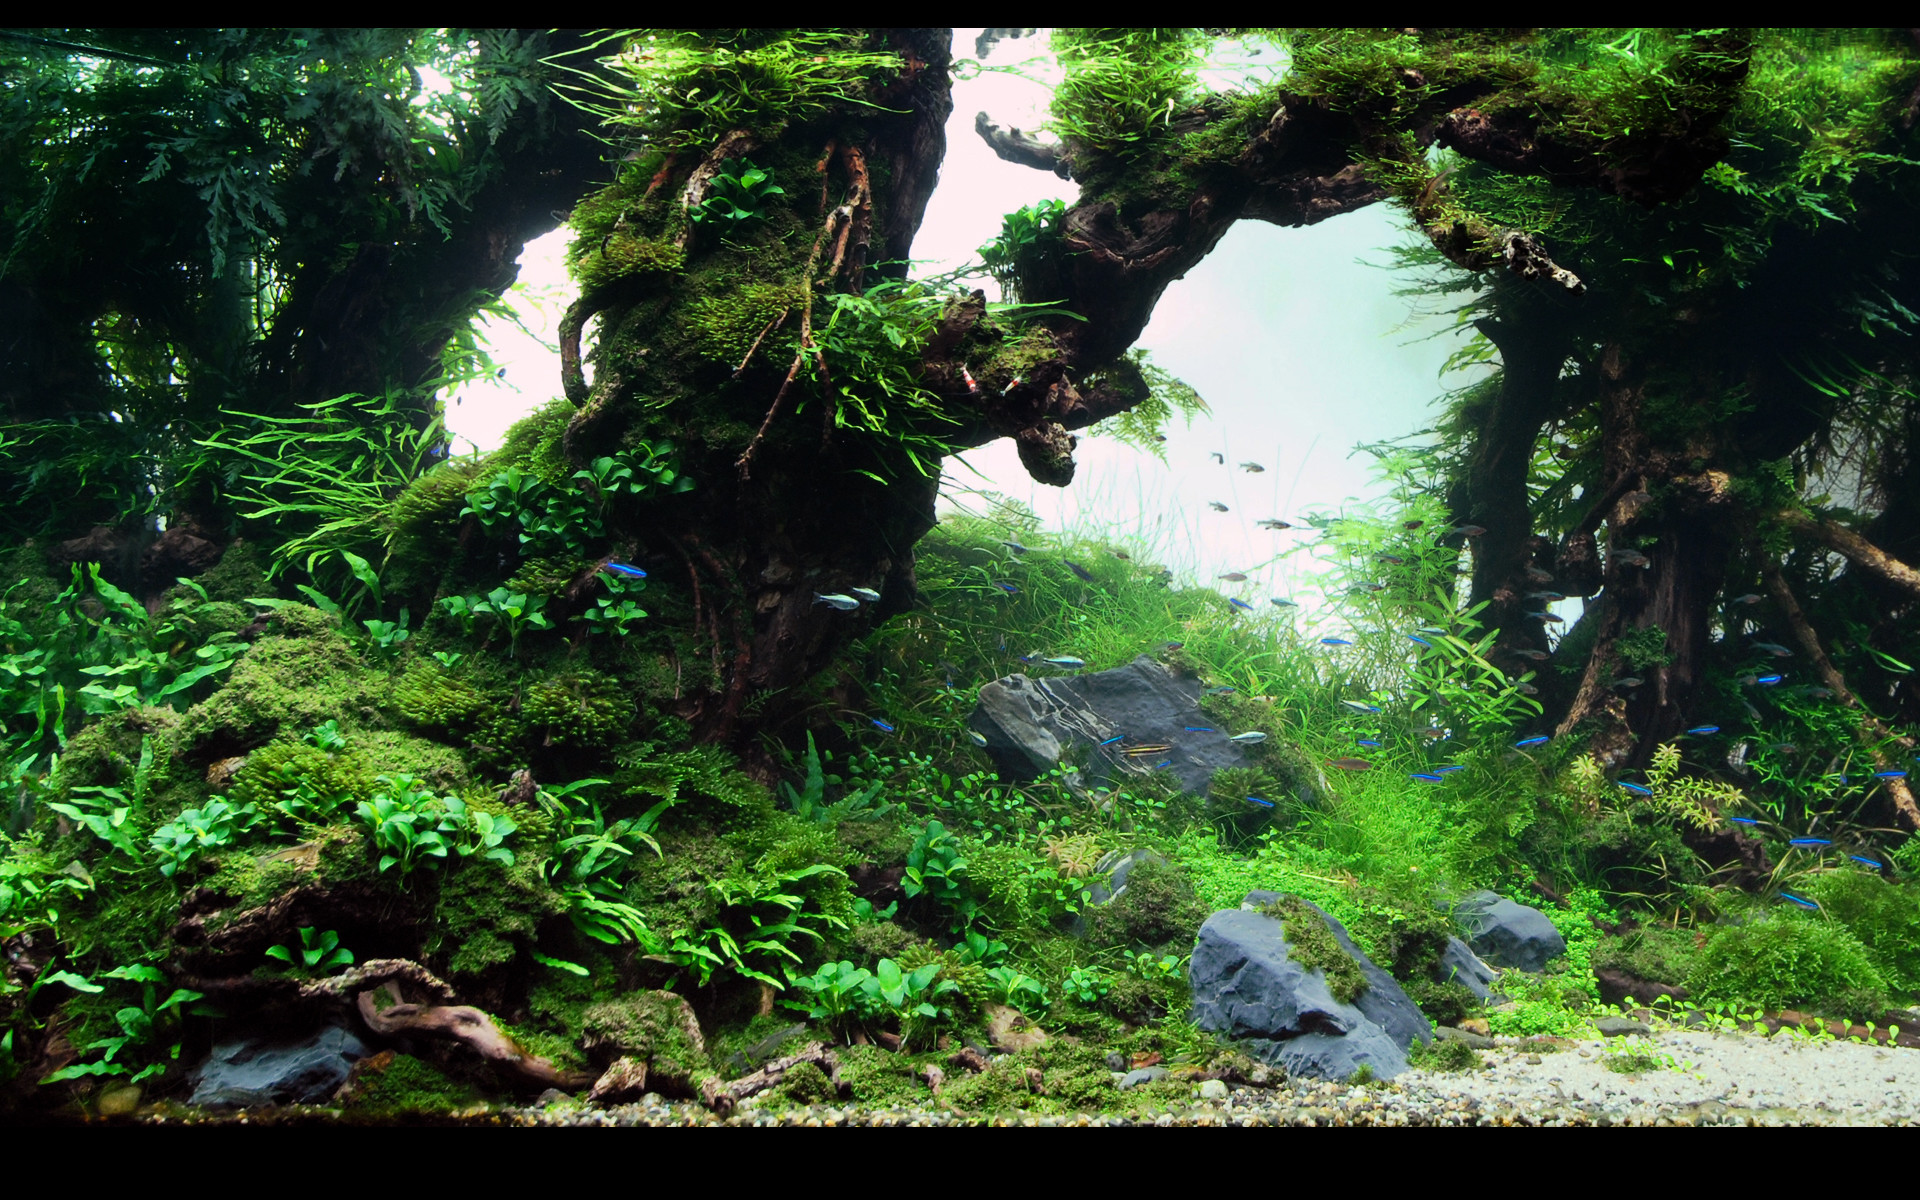 Animated Wallpaper And Desktop Backgrounds Aquarium Free Download : Tank  background wallpaper wallpapersafari